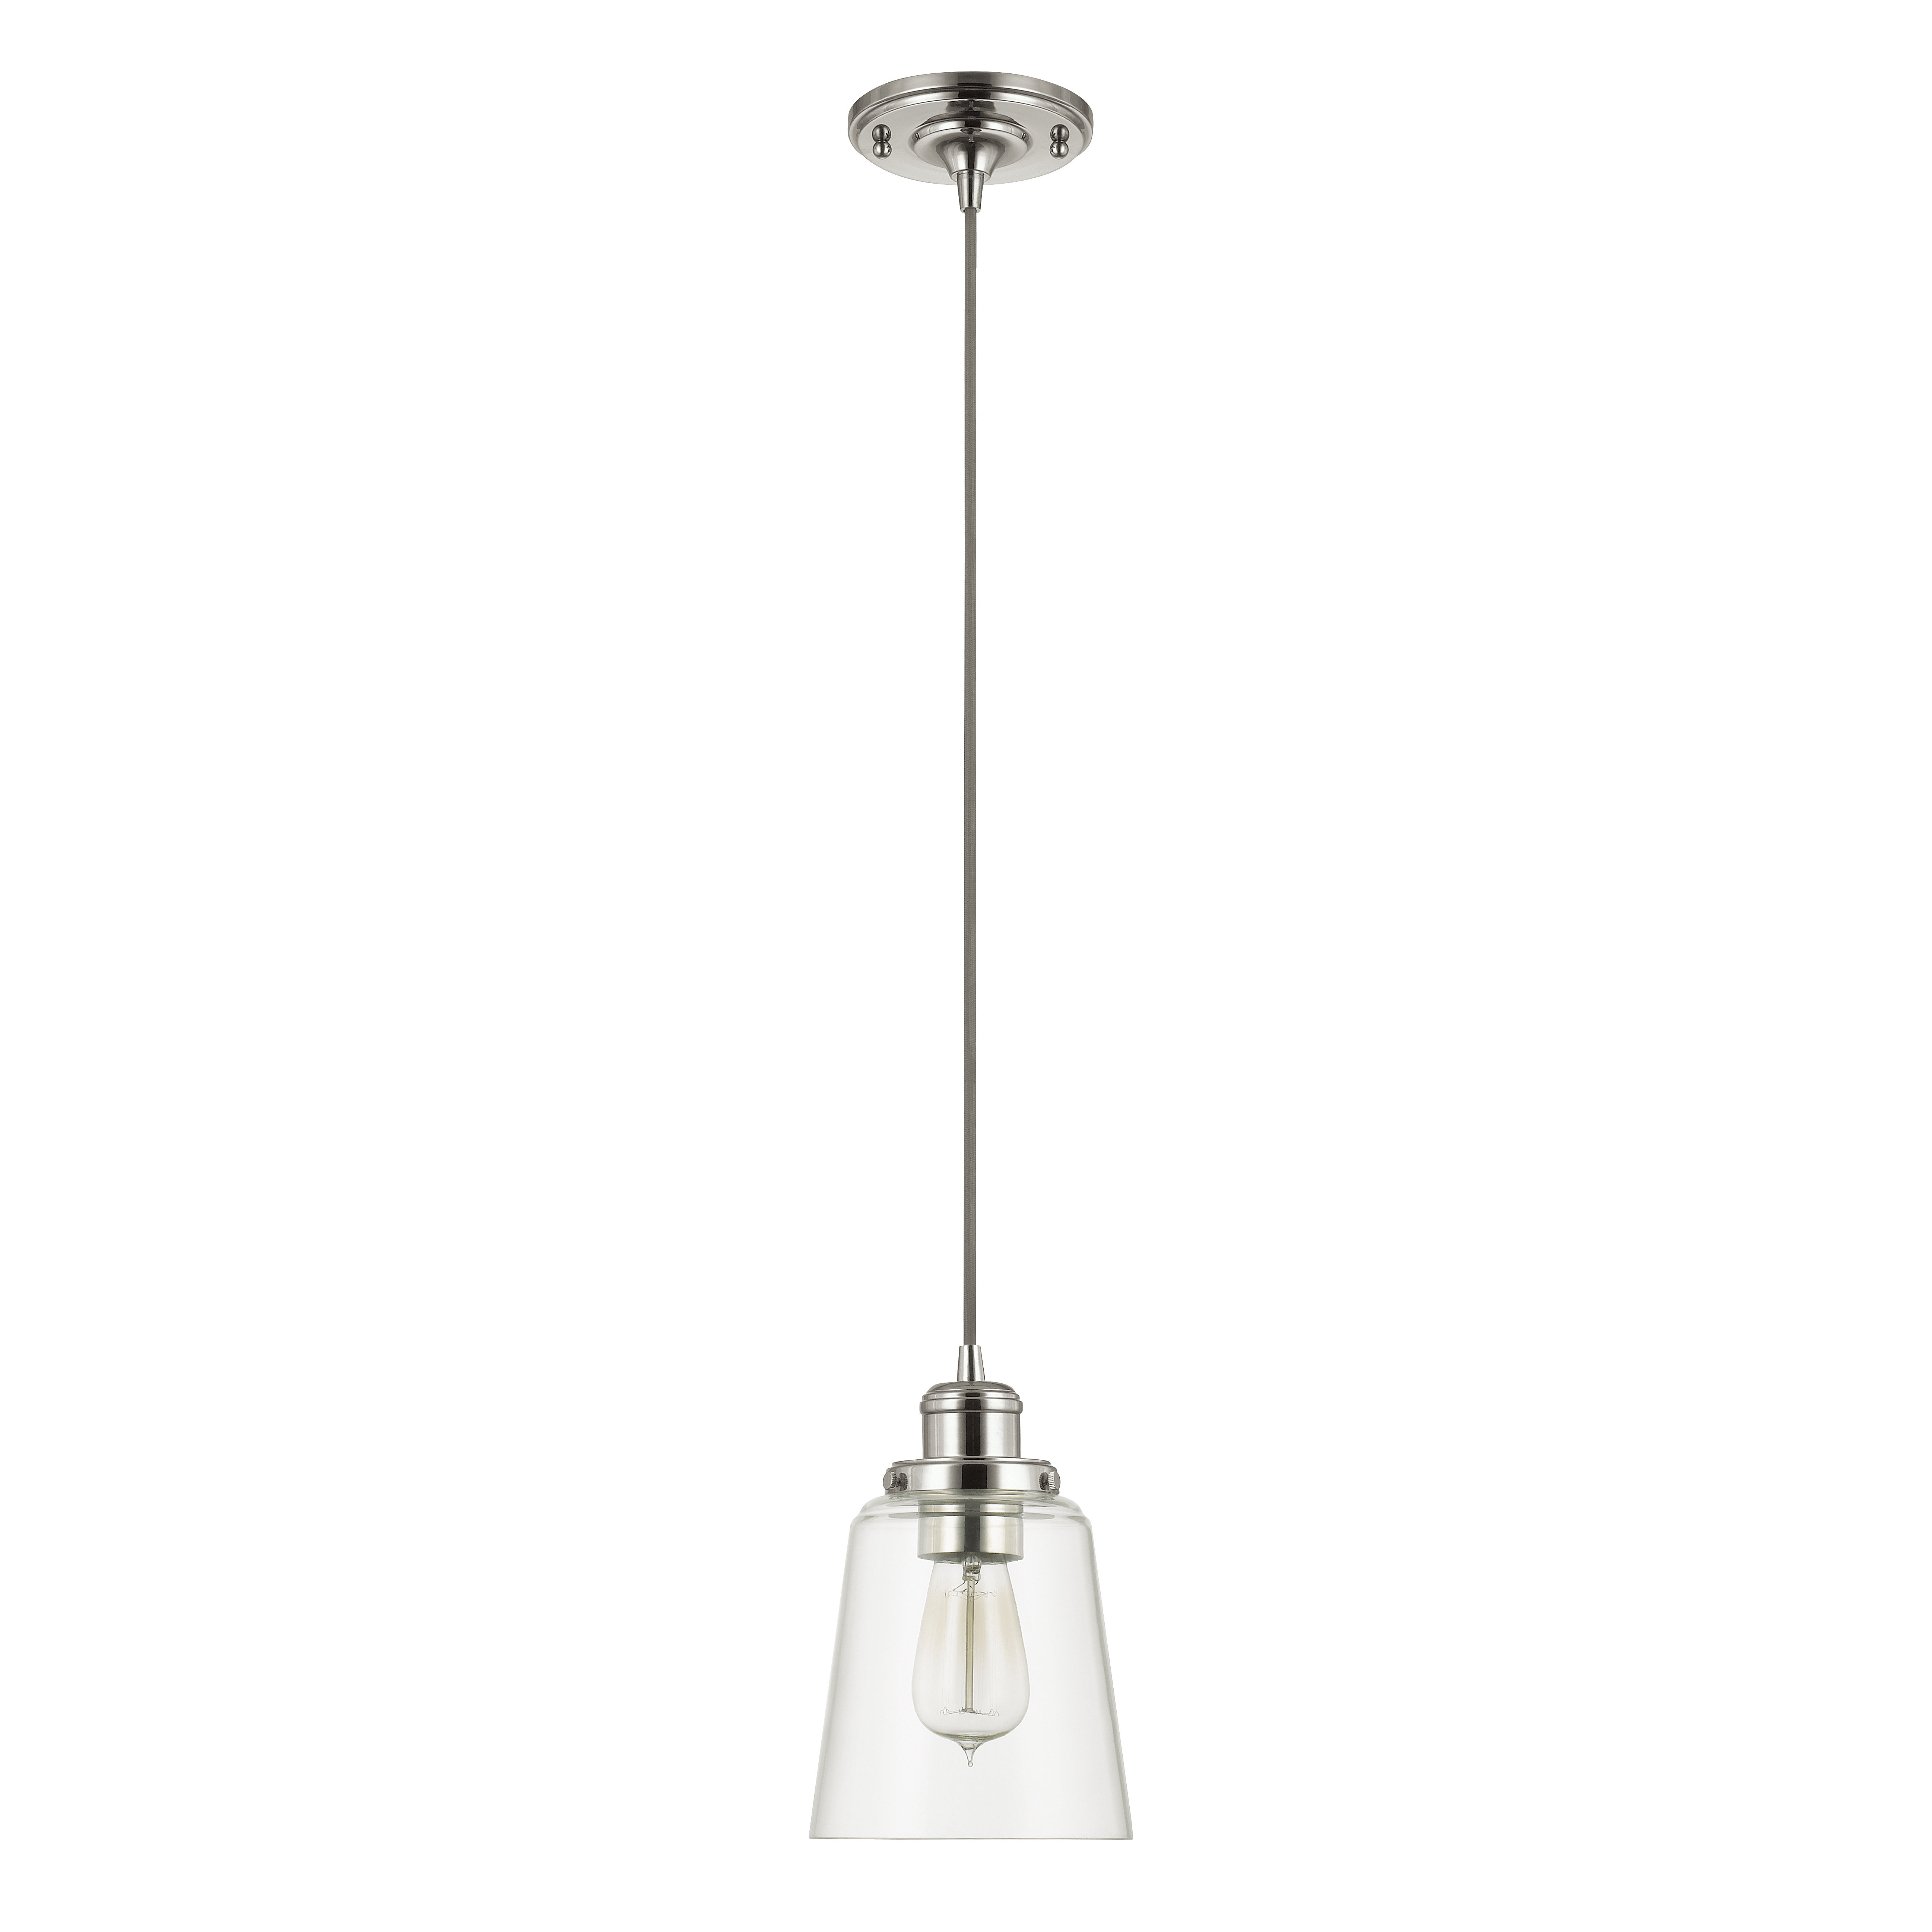 Most Recent Carey 1 Light Single Bell Pendants Throughout Birch Lane™ Heritage 1 Light Single Bell Pendant (View 19 of 25)